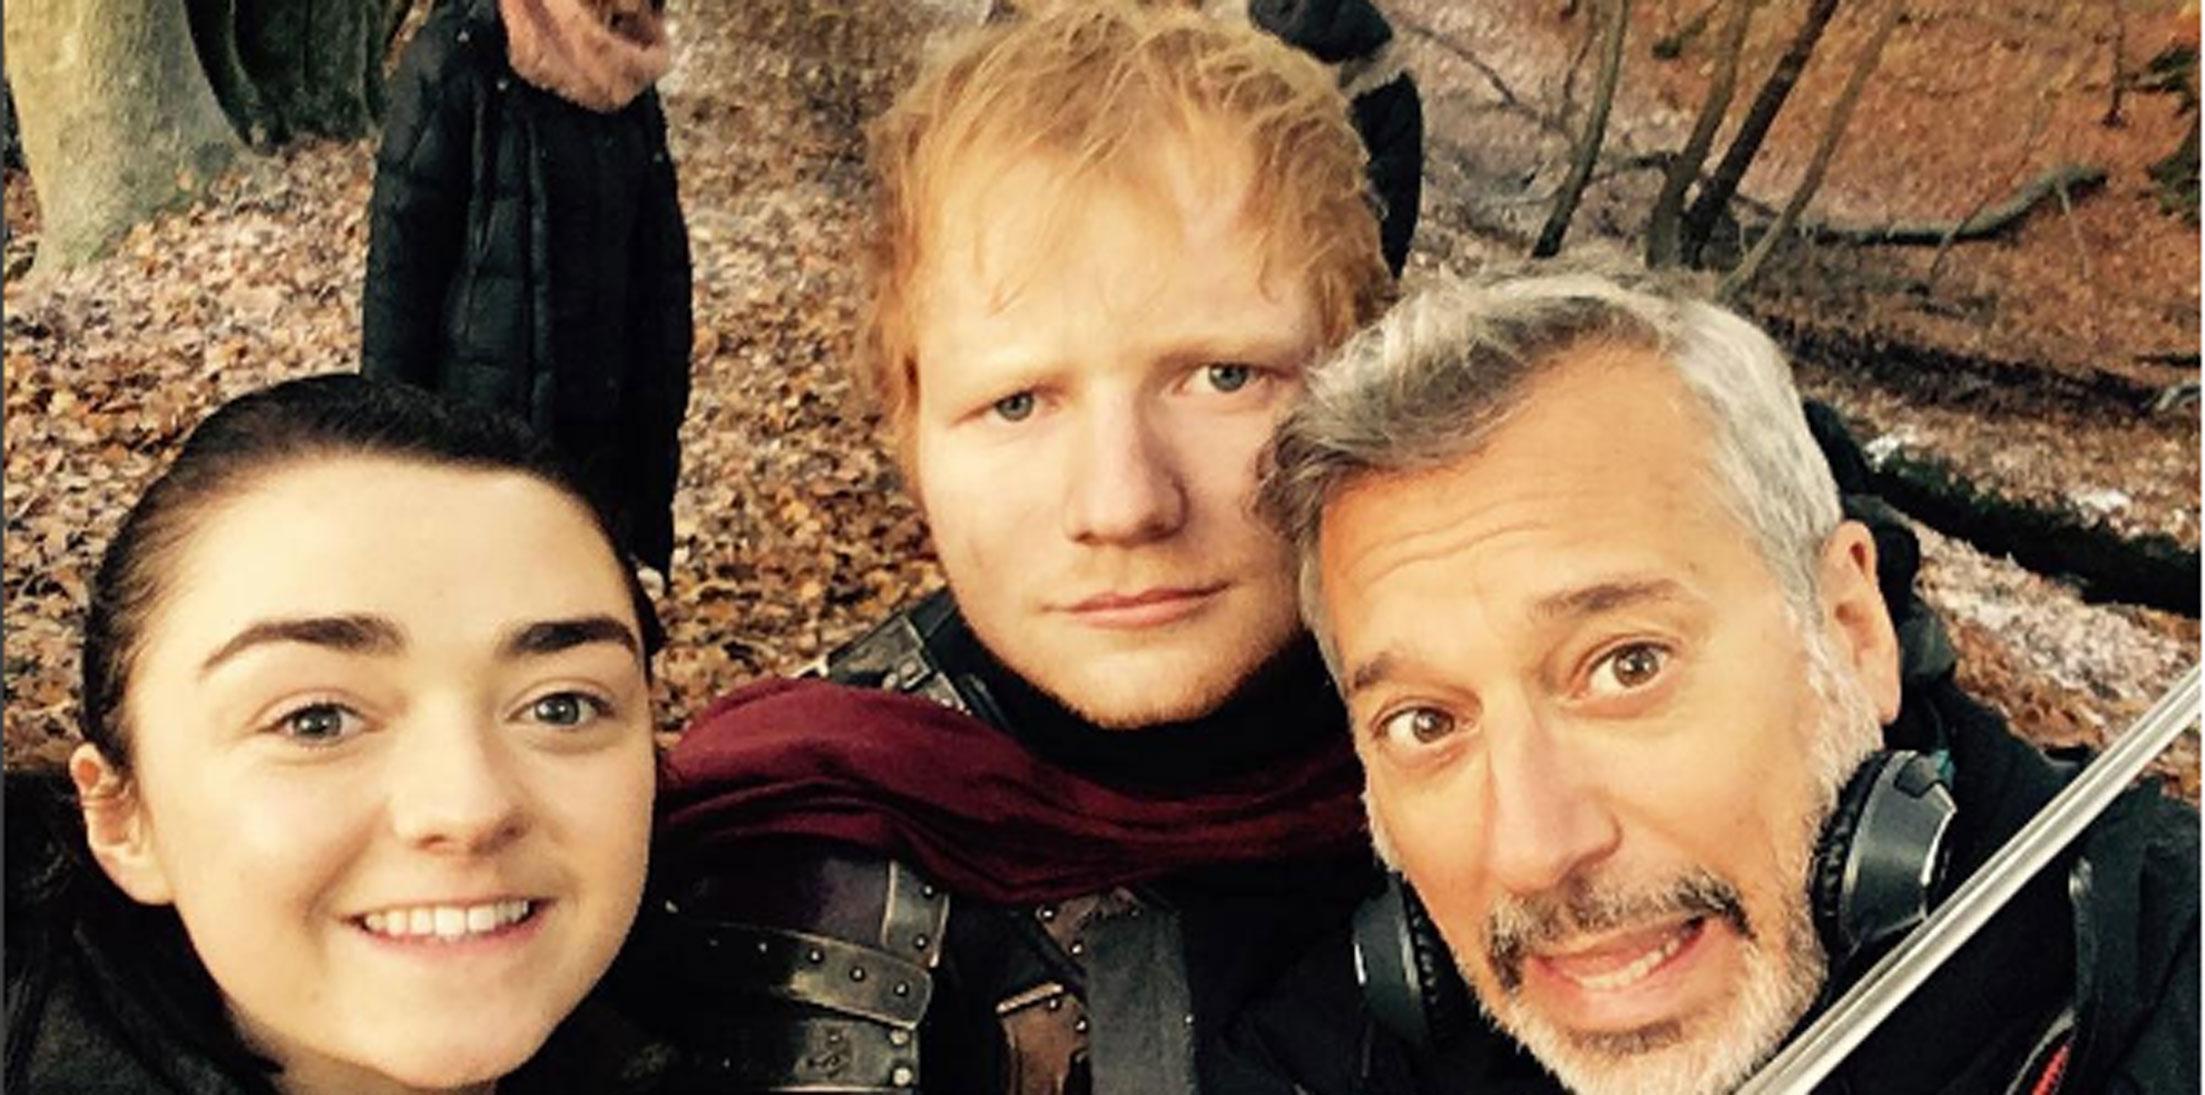 Game Of Thrones Premiere Ed Sheeran Cameo Long